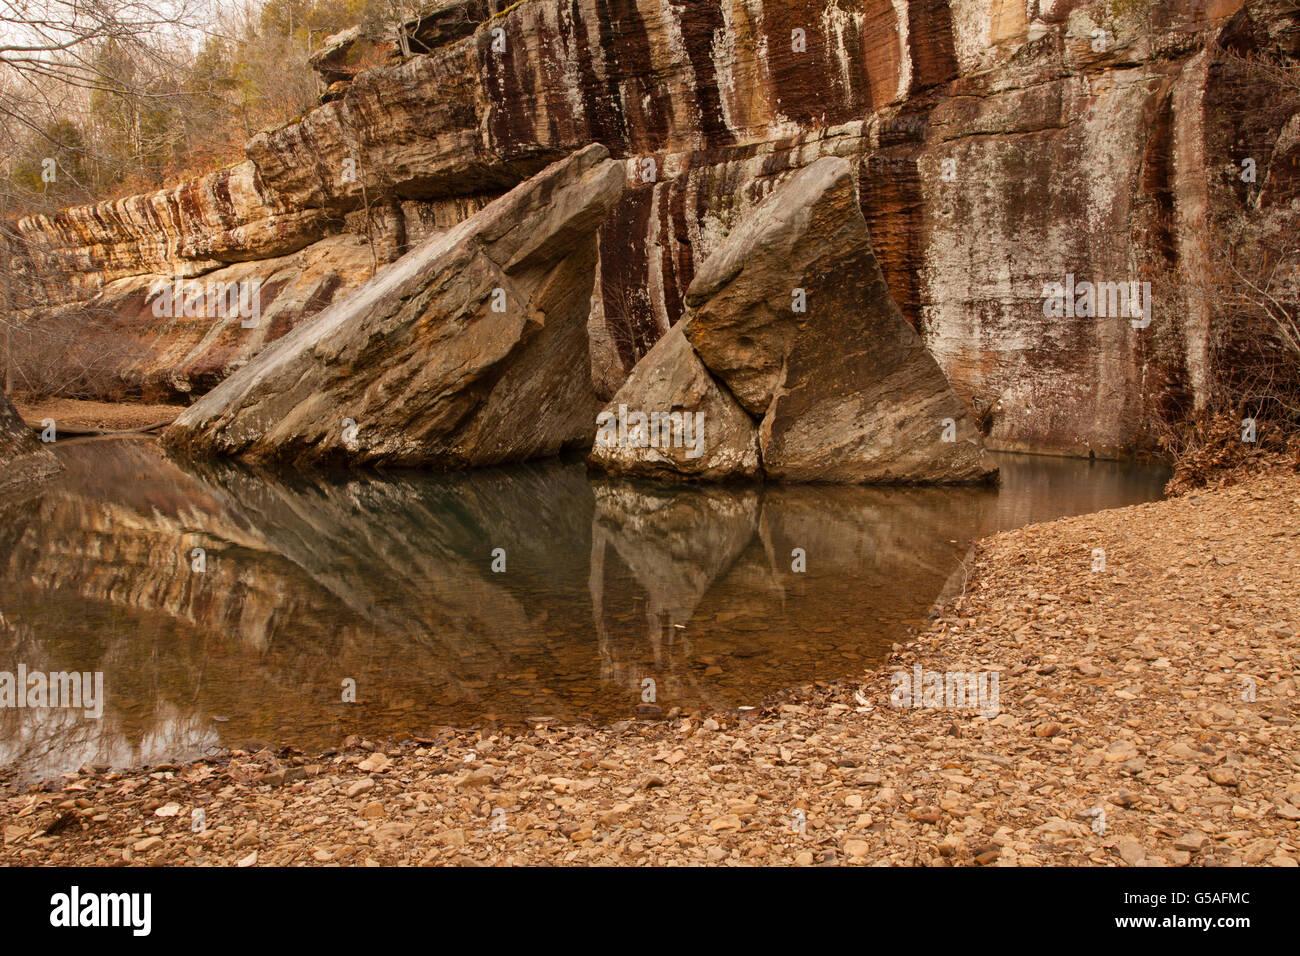 Devil's Backbone Formation at Shawnee National Forest - Stock Image